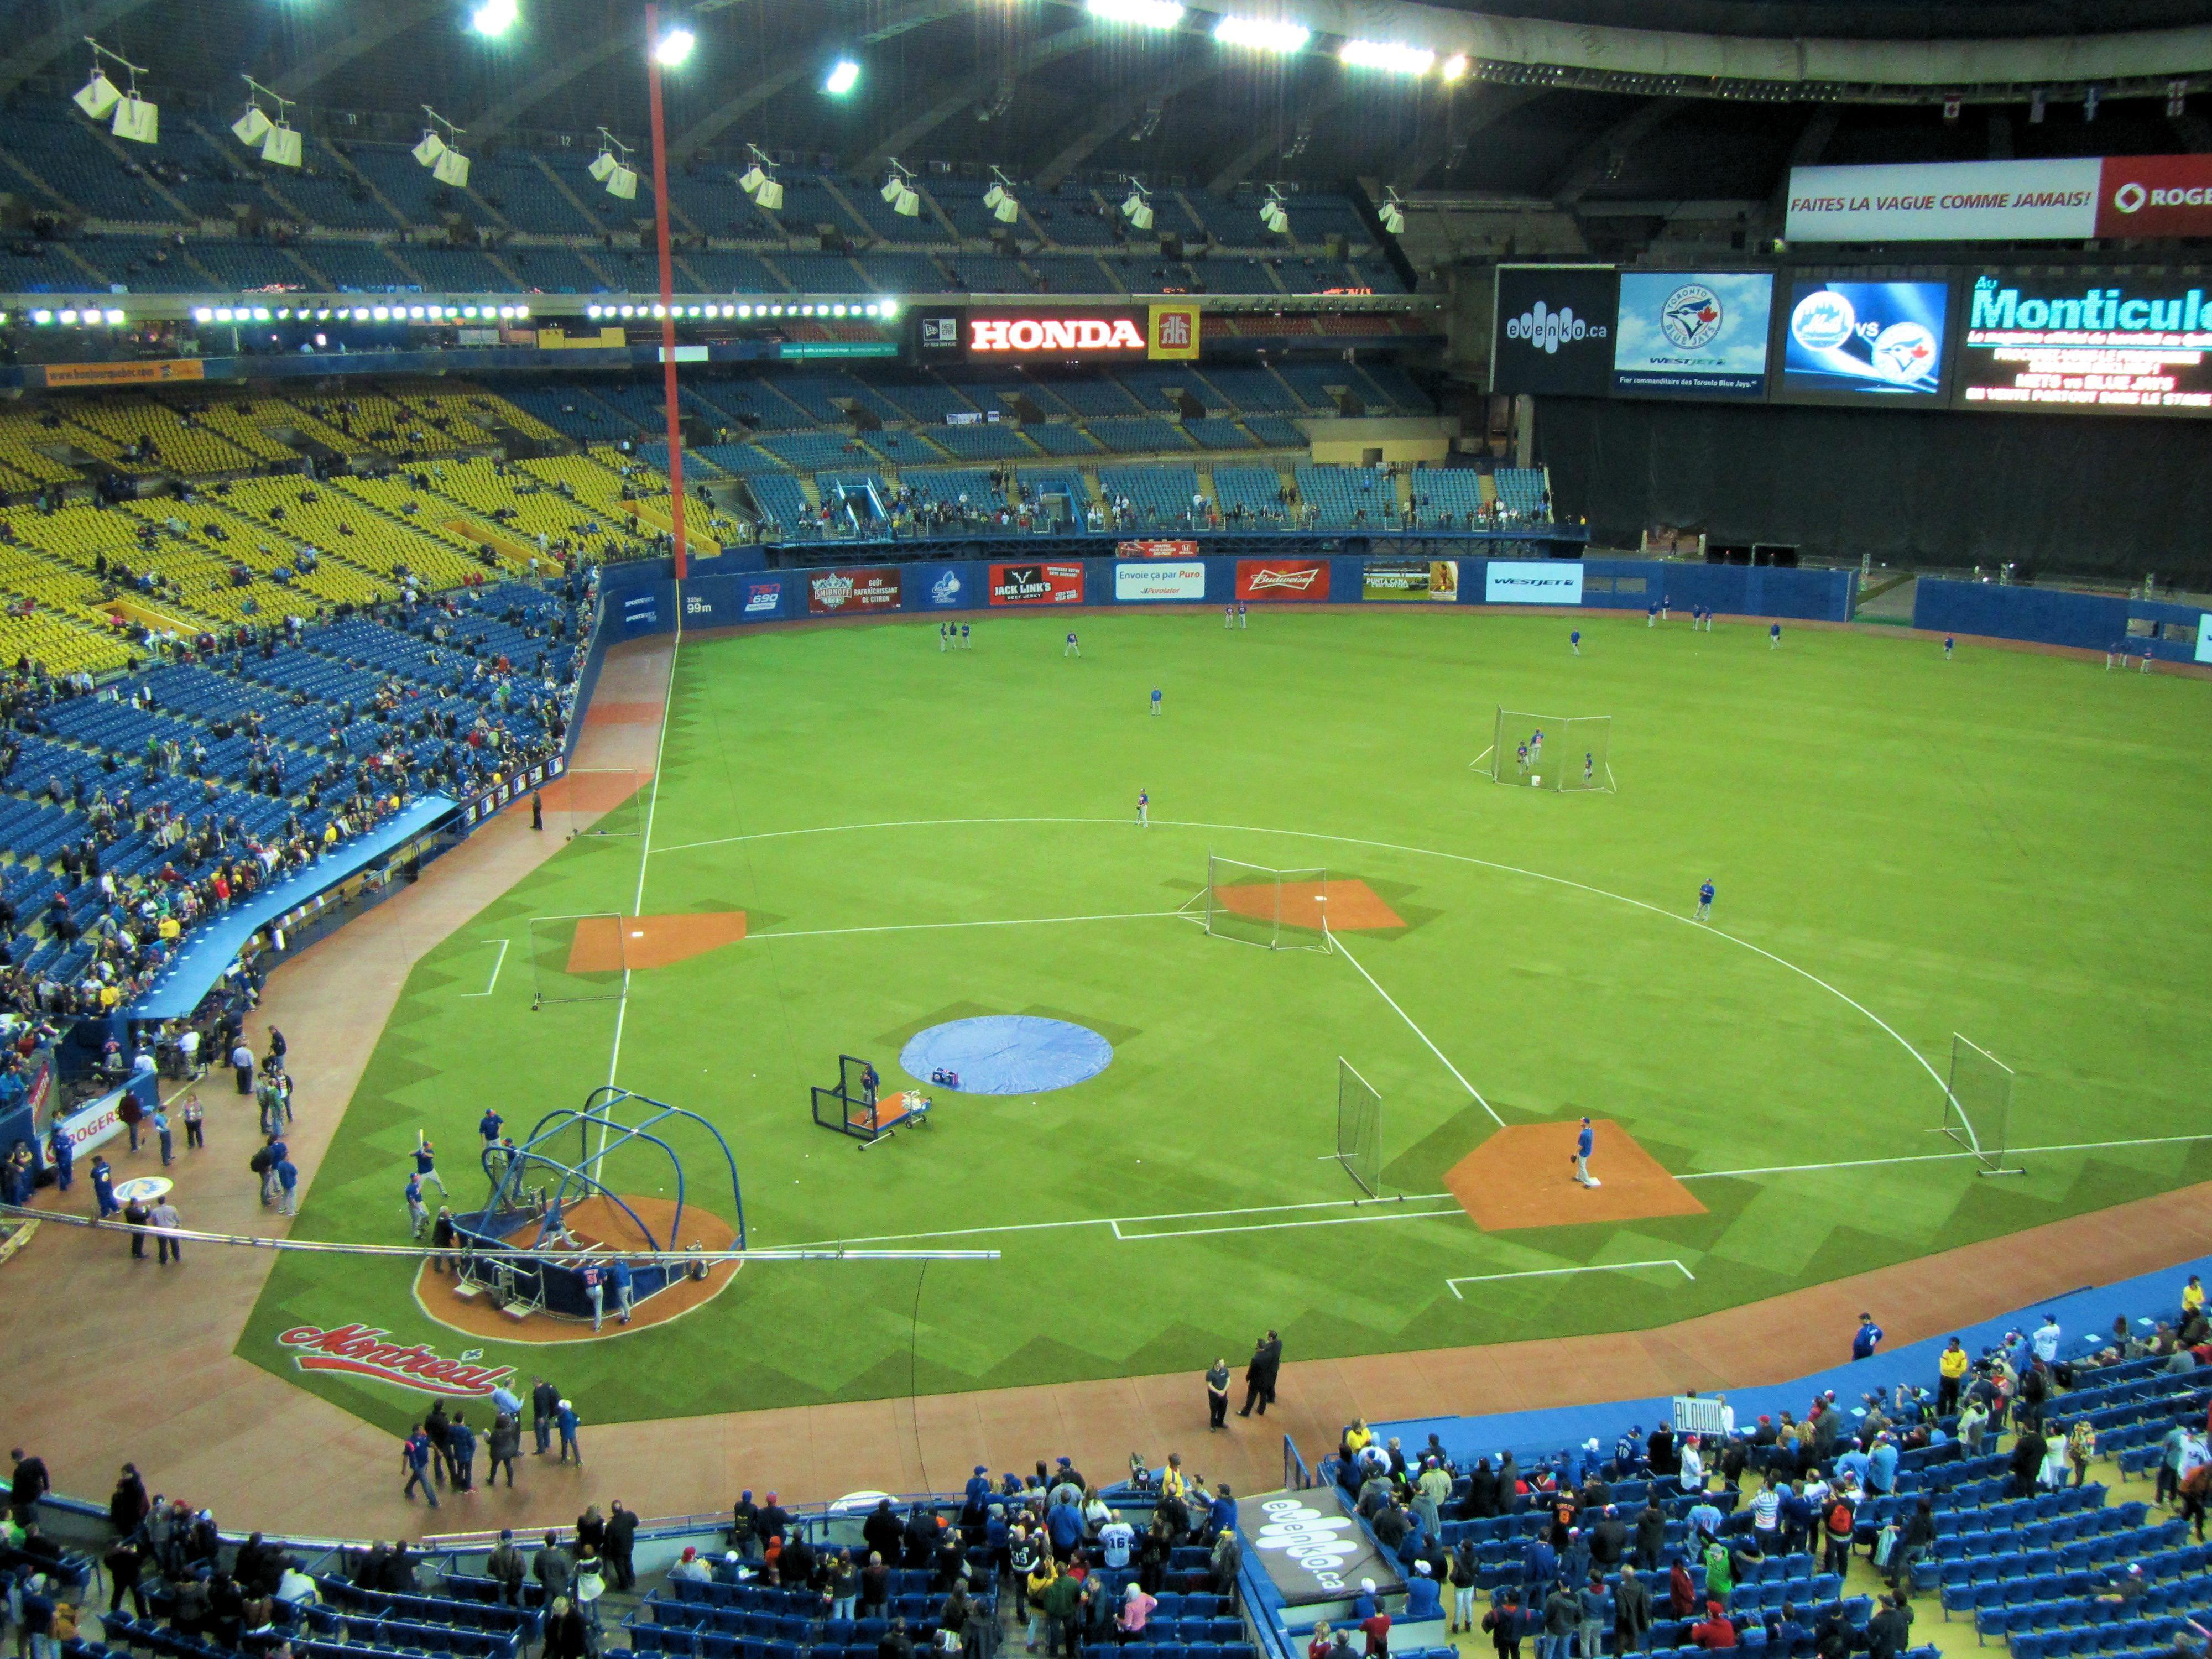 Olympic Stadium Montreal Expos Montreal Quebec 2014